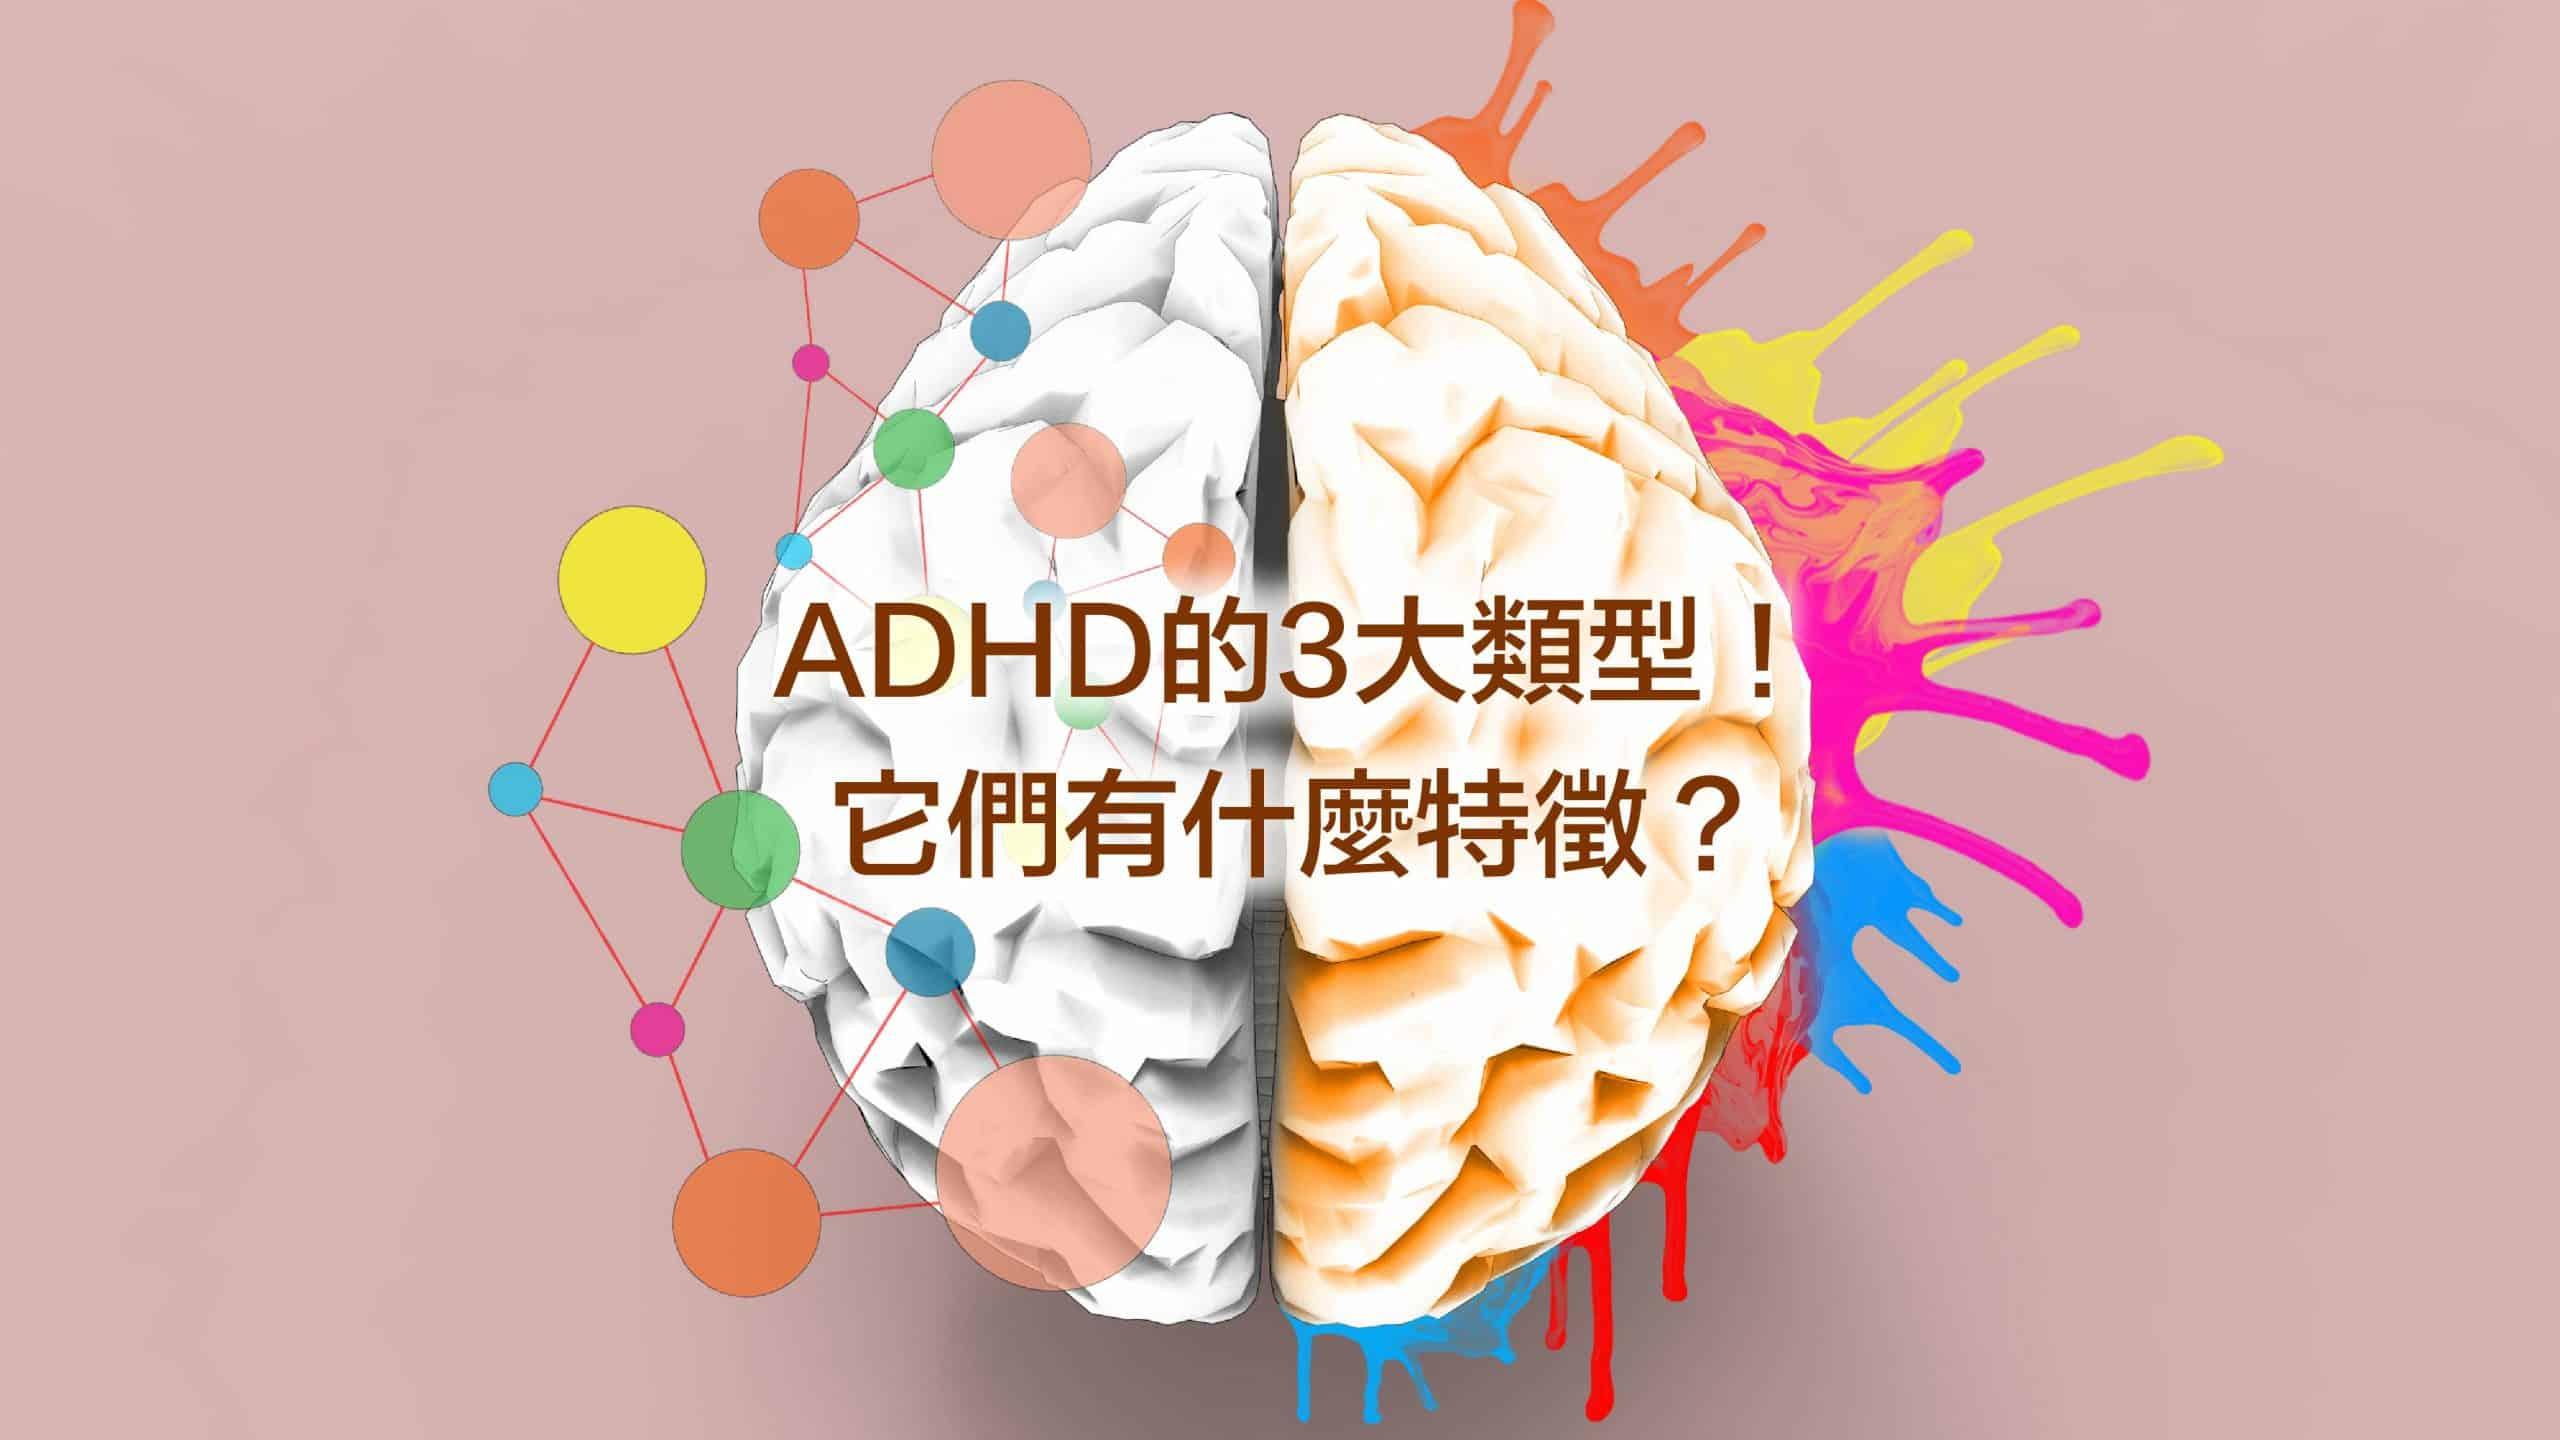 ADHD的3大類型!它們有什麼特徵?